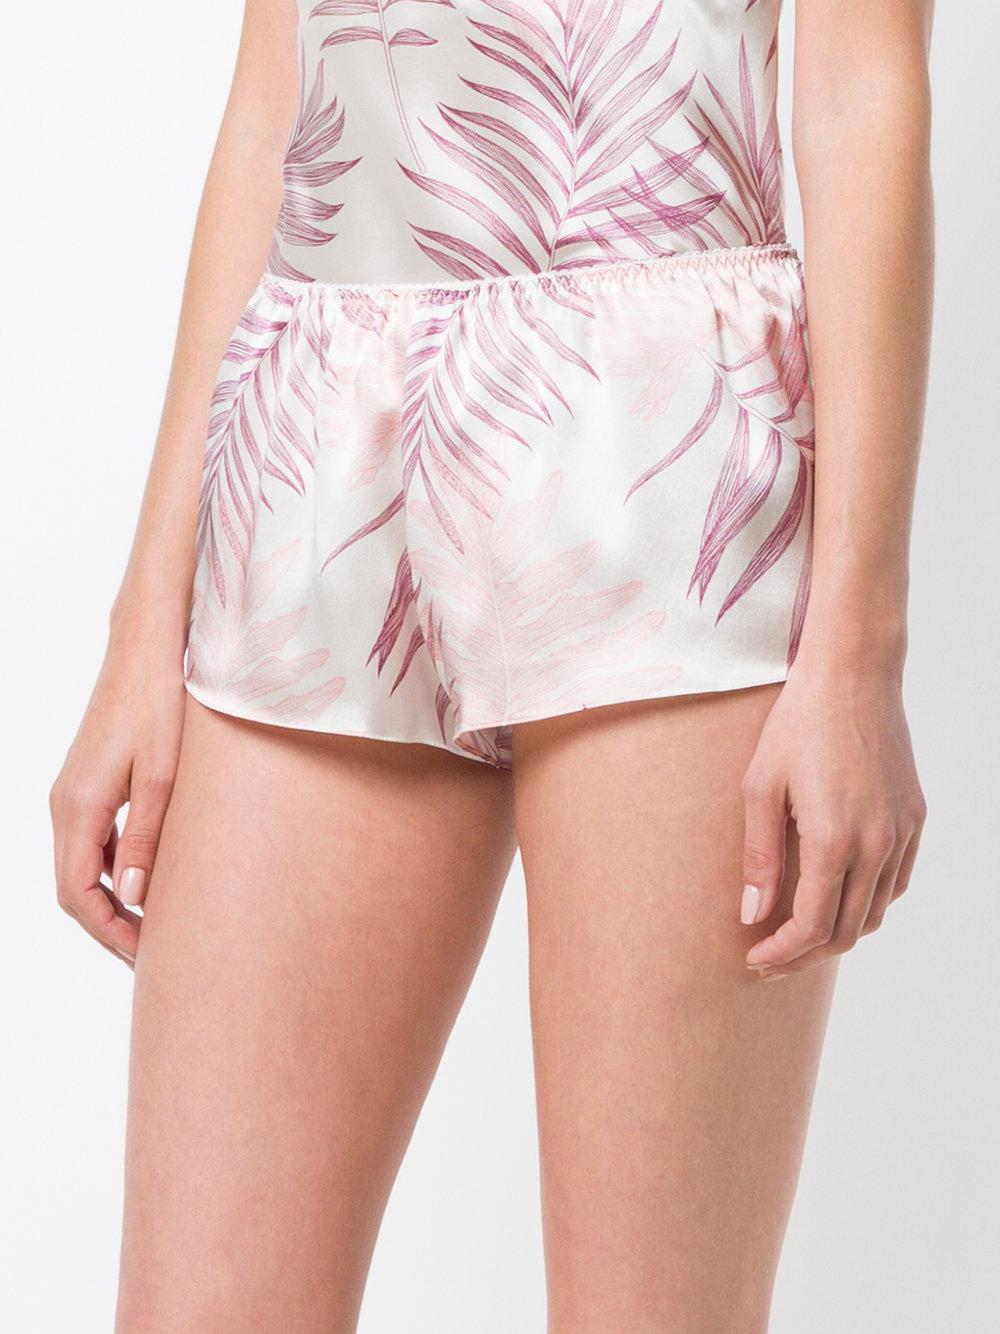 short loose nightwear shorts - Pink & Purple Gilda & Pearl Cheap New XjKXC